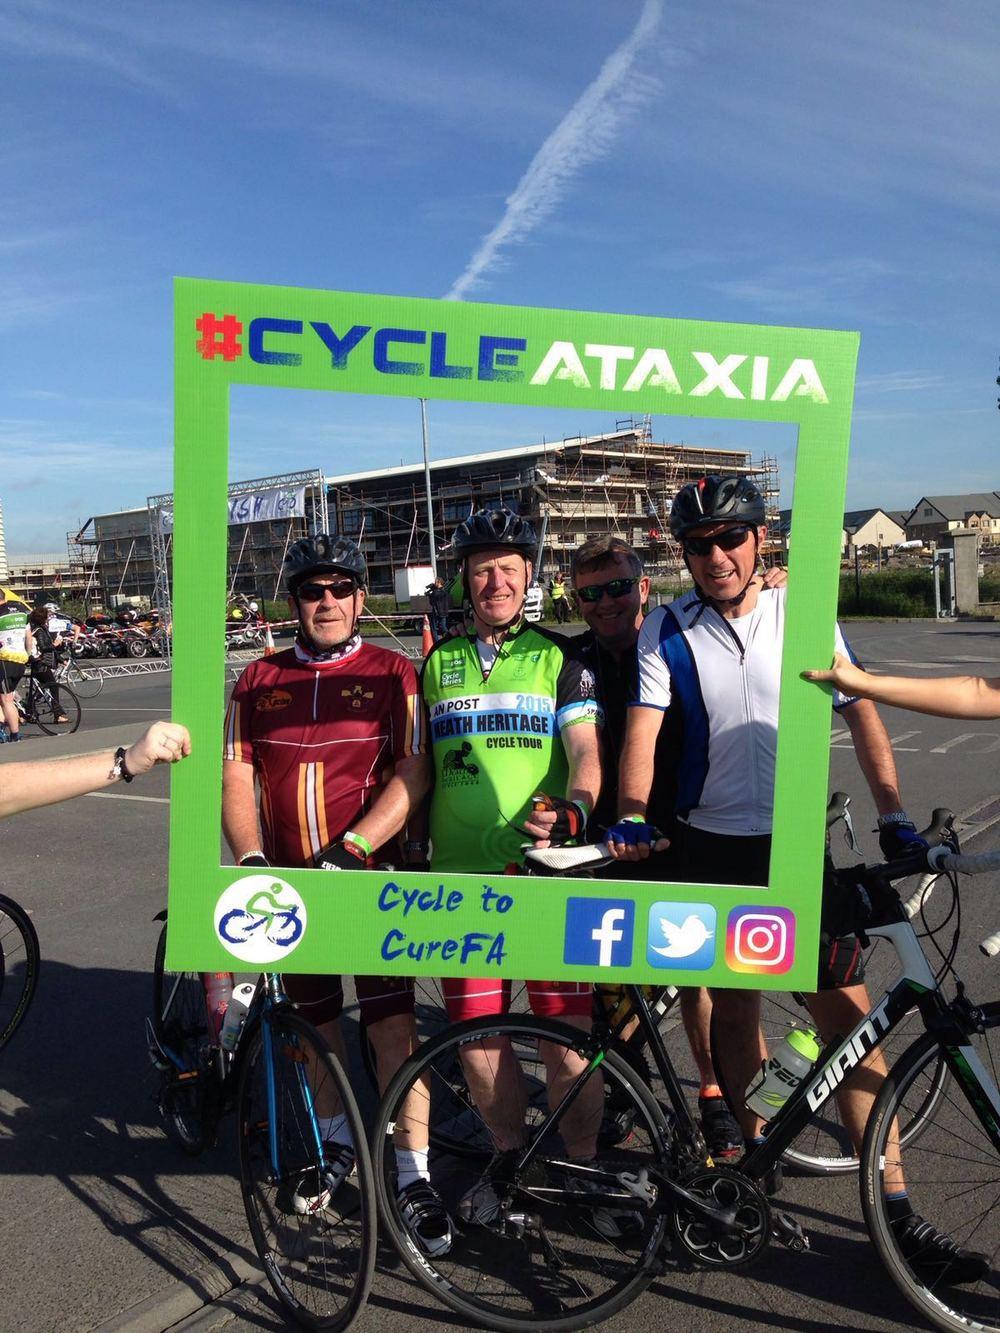 Cycle Ataxia Venue (73).JPG